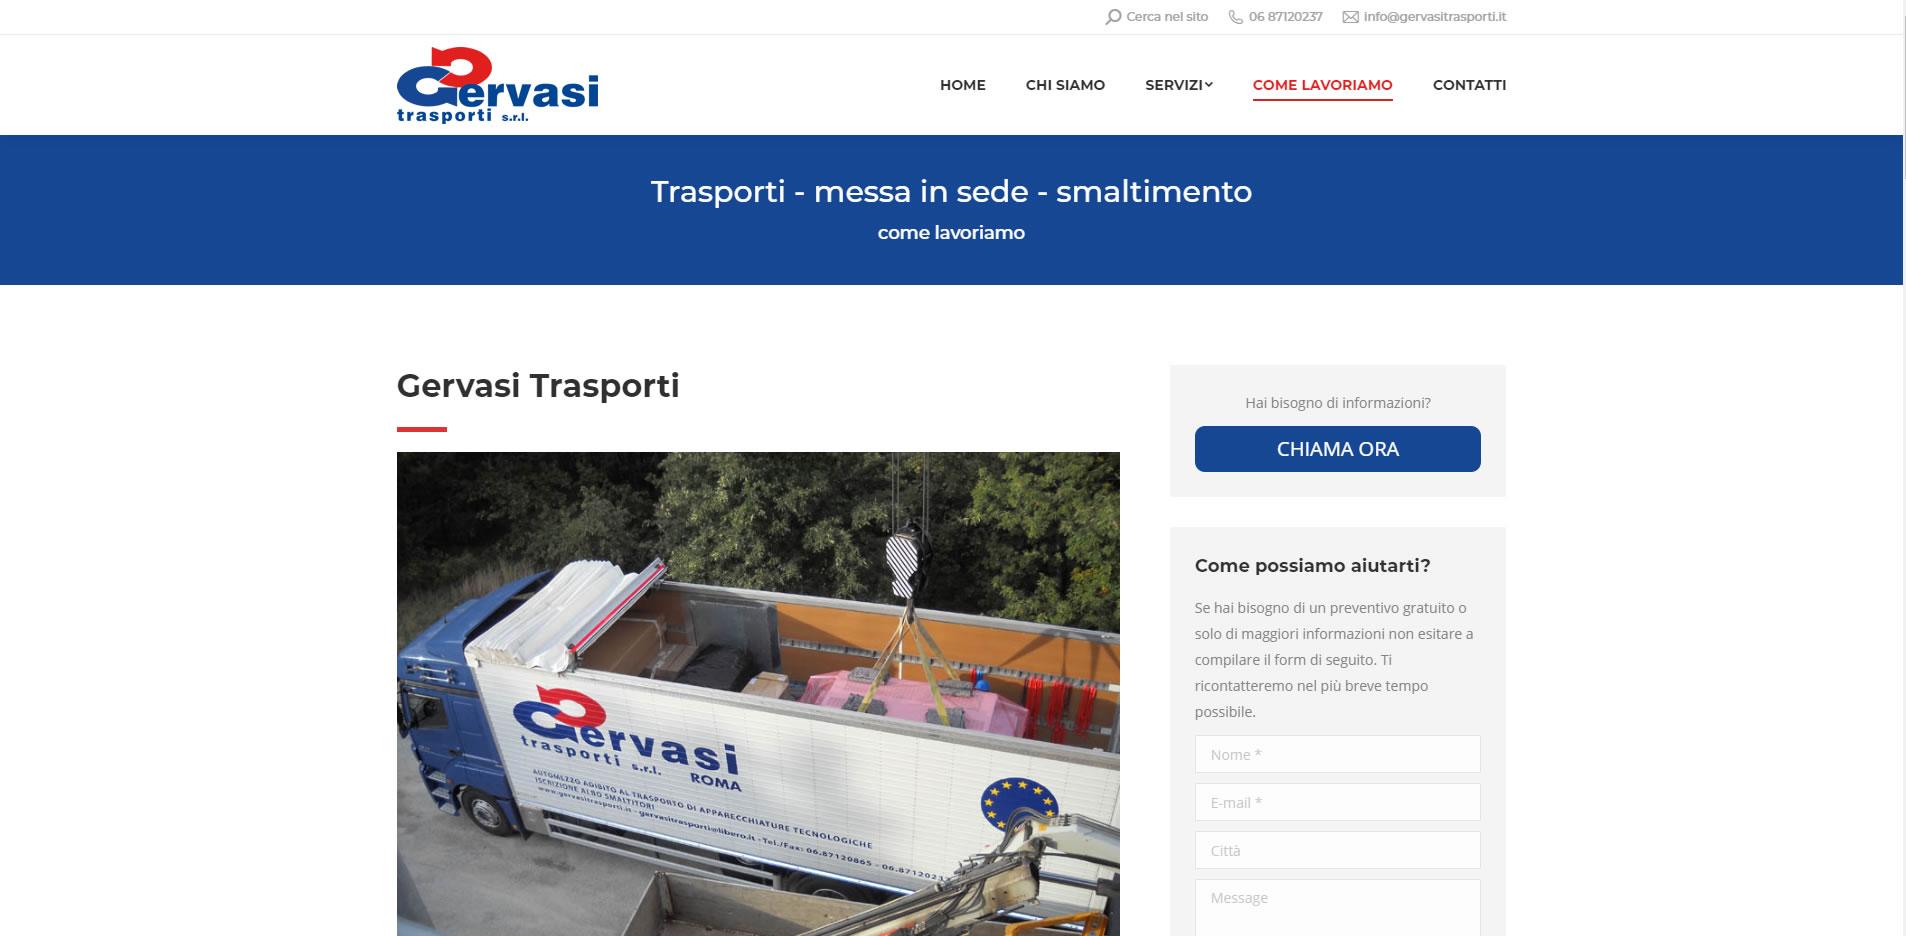 gervasi trasporti elettromedicali sito web turnkey